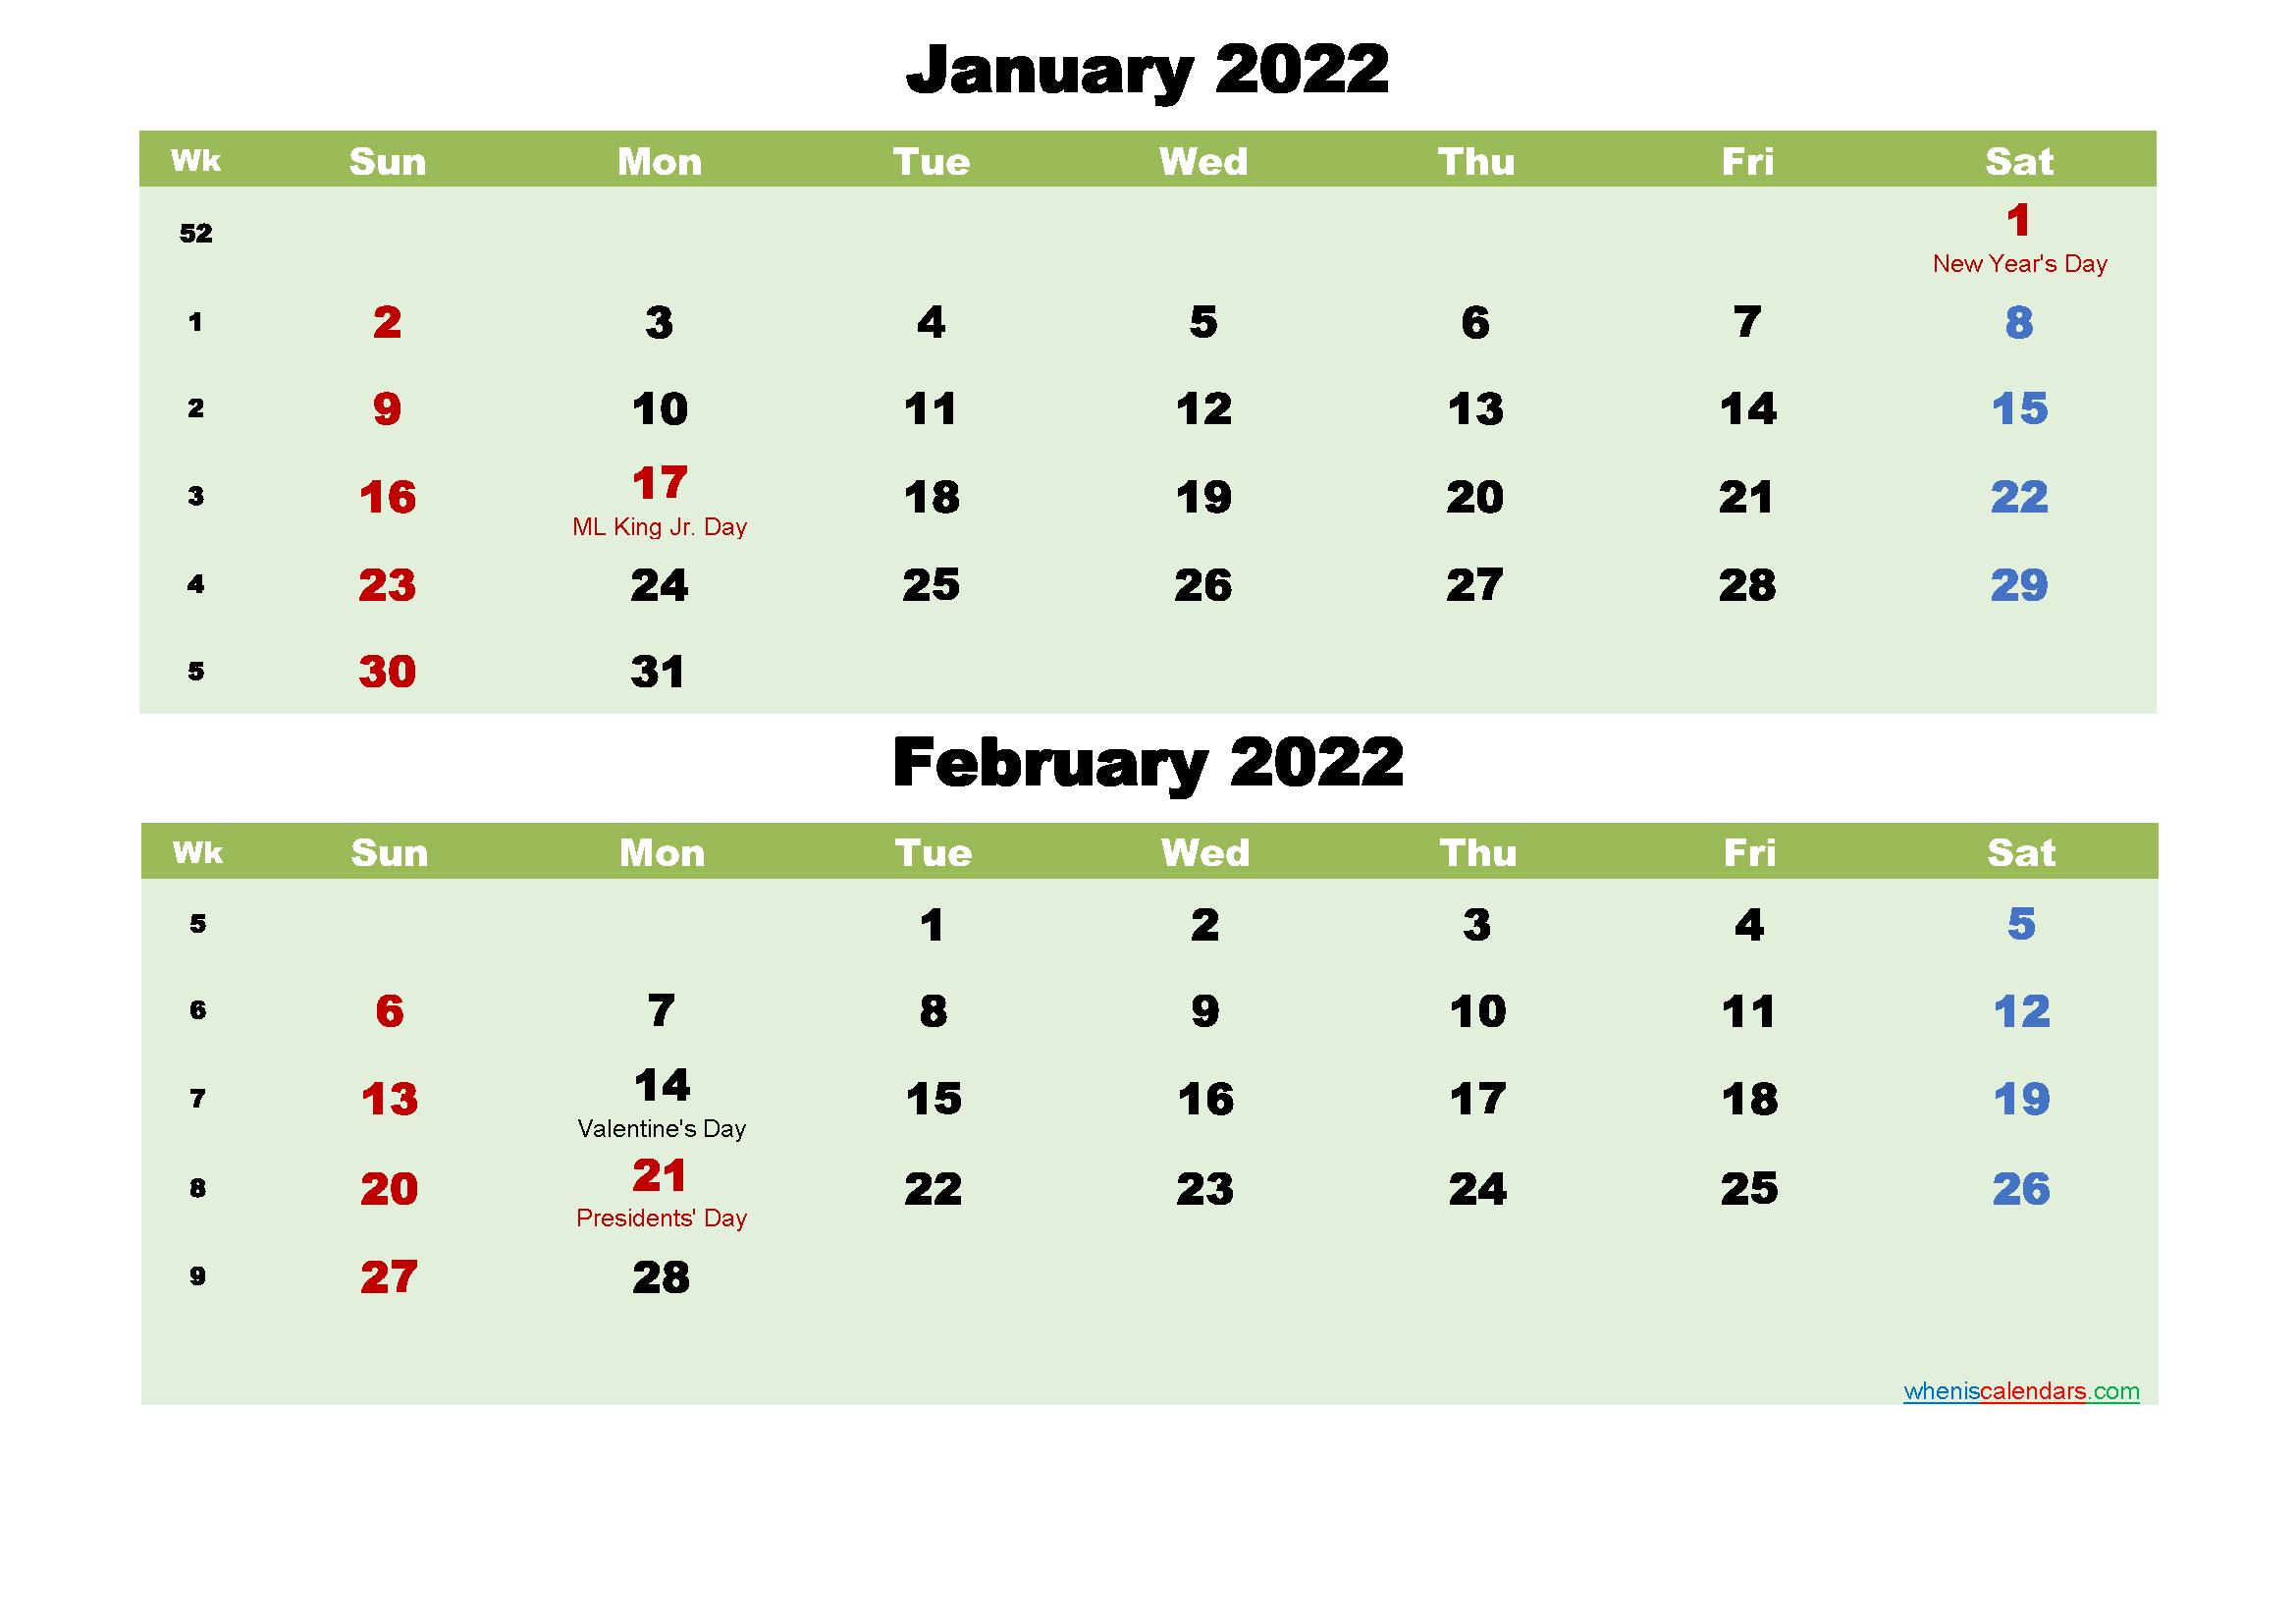 January and February 2022 Calendar with Holidays